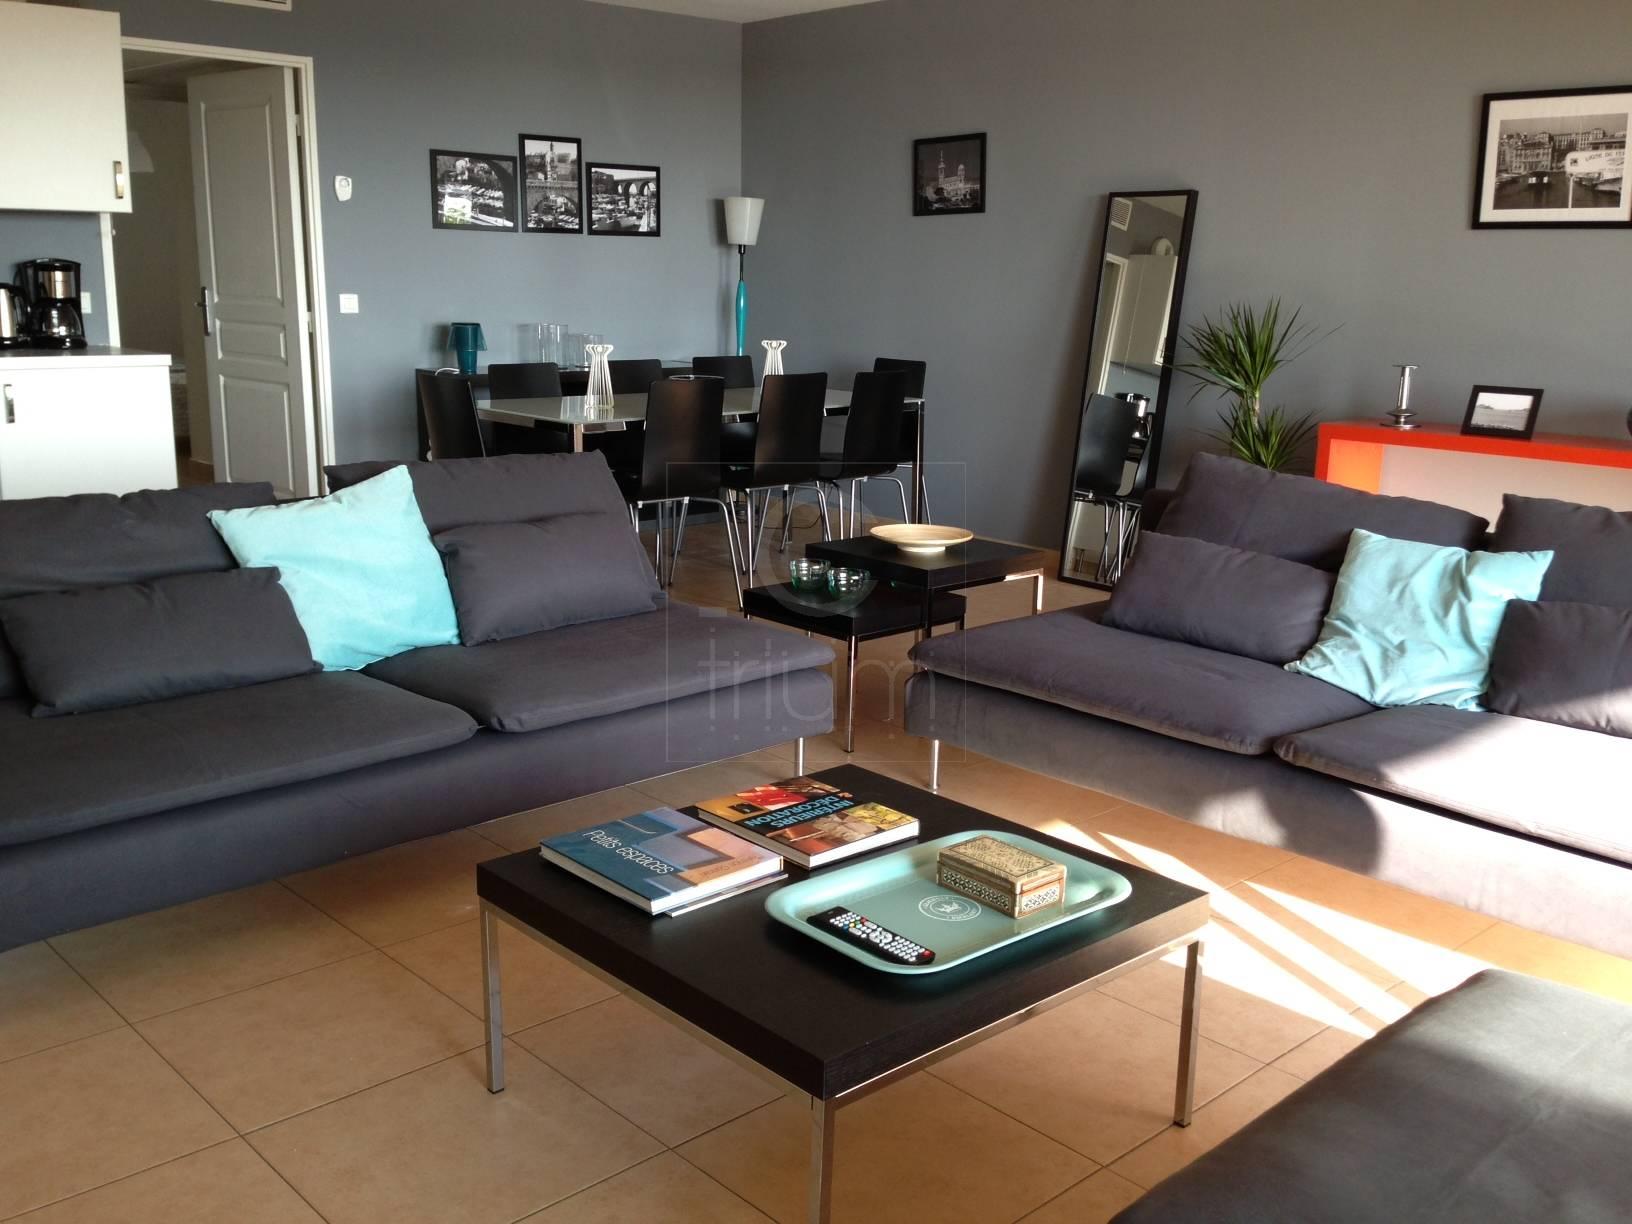 location appartement t4 f4 marseille 7eme bompard terrasse garage meubl agence immobili re. Black Bedroom Furniture Sets. Home Design Ideas